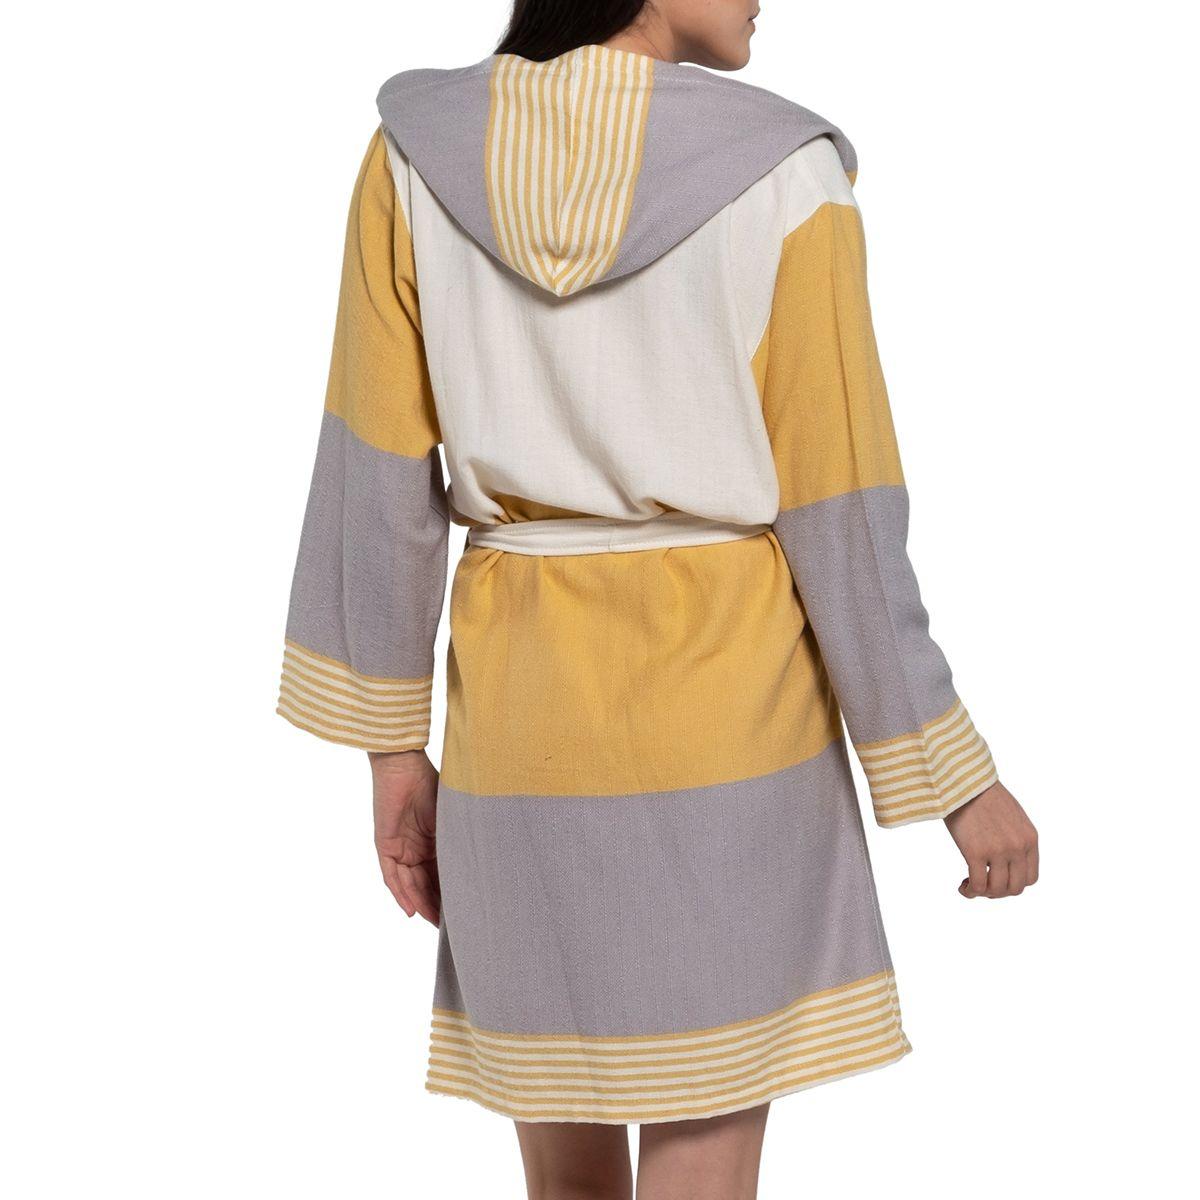 Bathrobe Twin Sultan with hood - Yellow / Light Grey